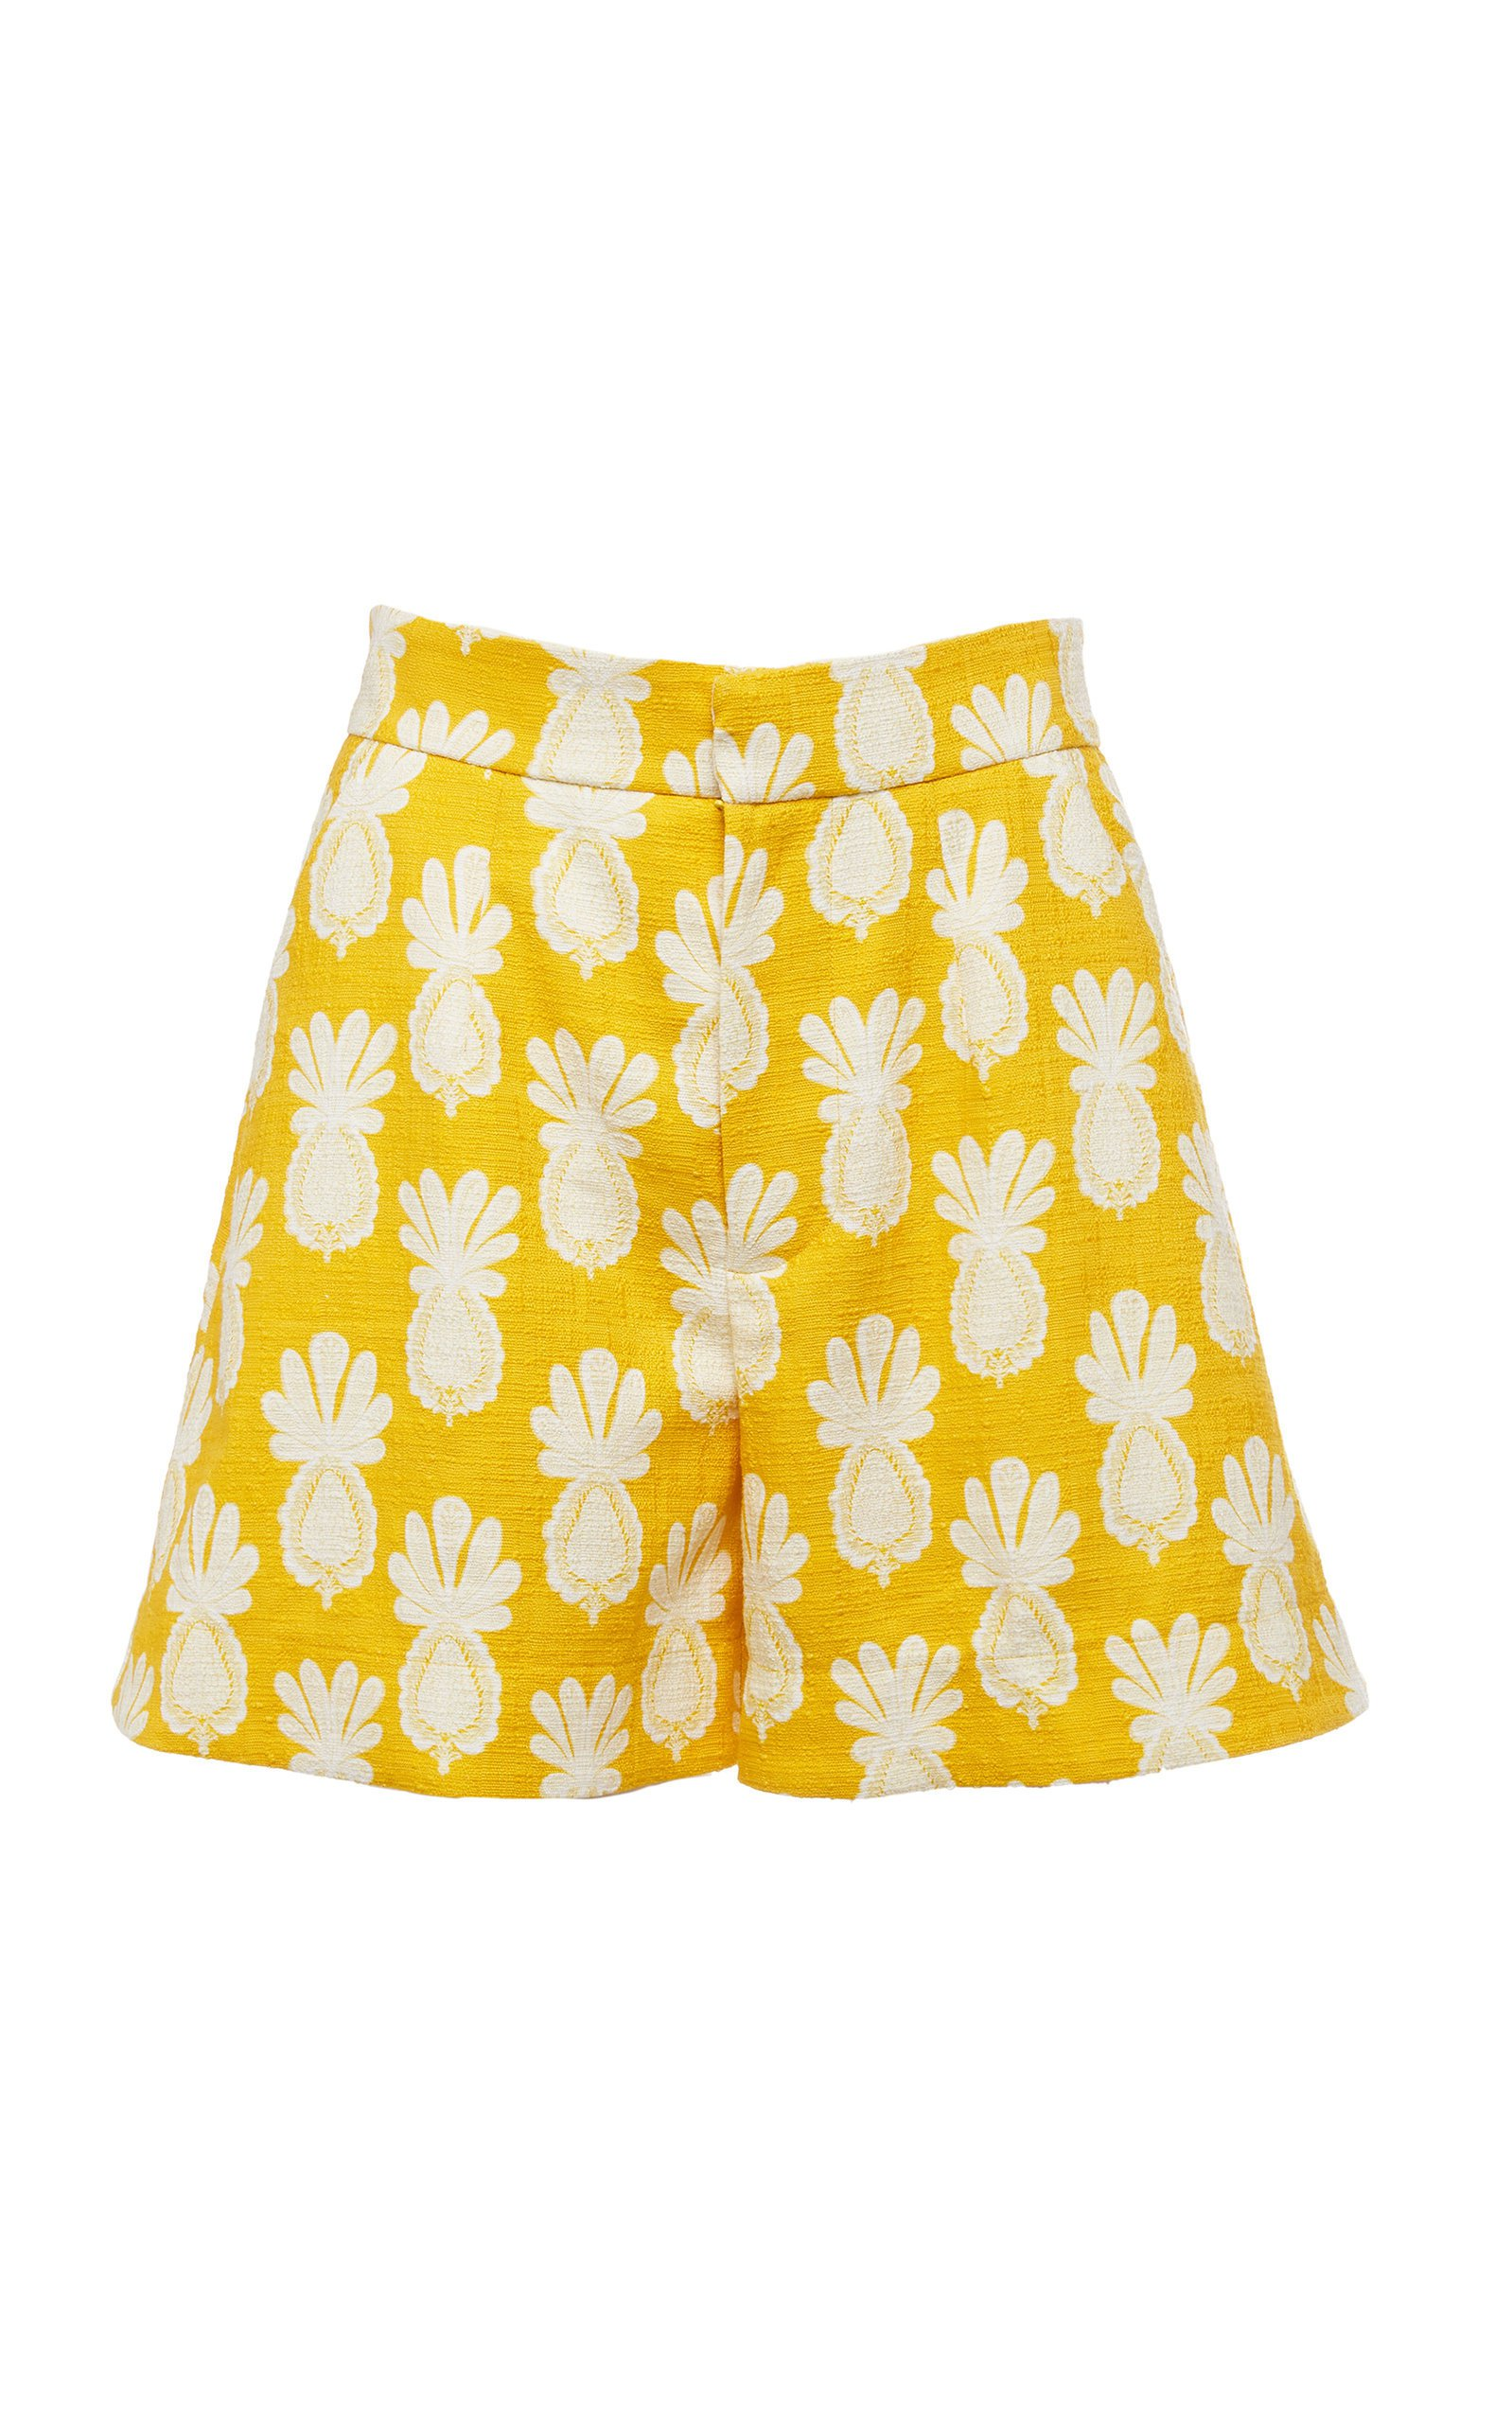 La DoubleJ Good Butt High-Rise Printed Shorts Size: XS